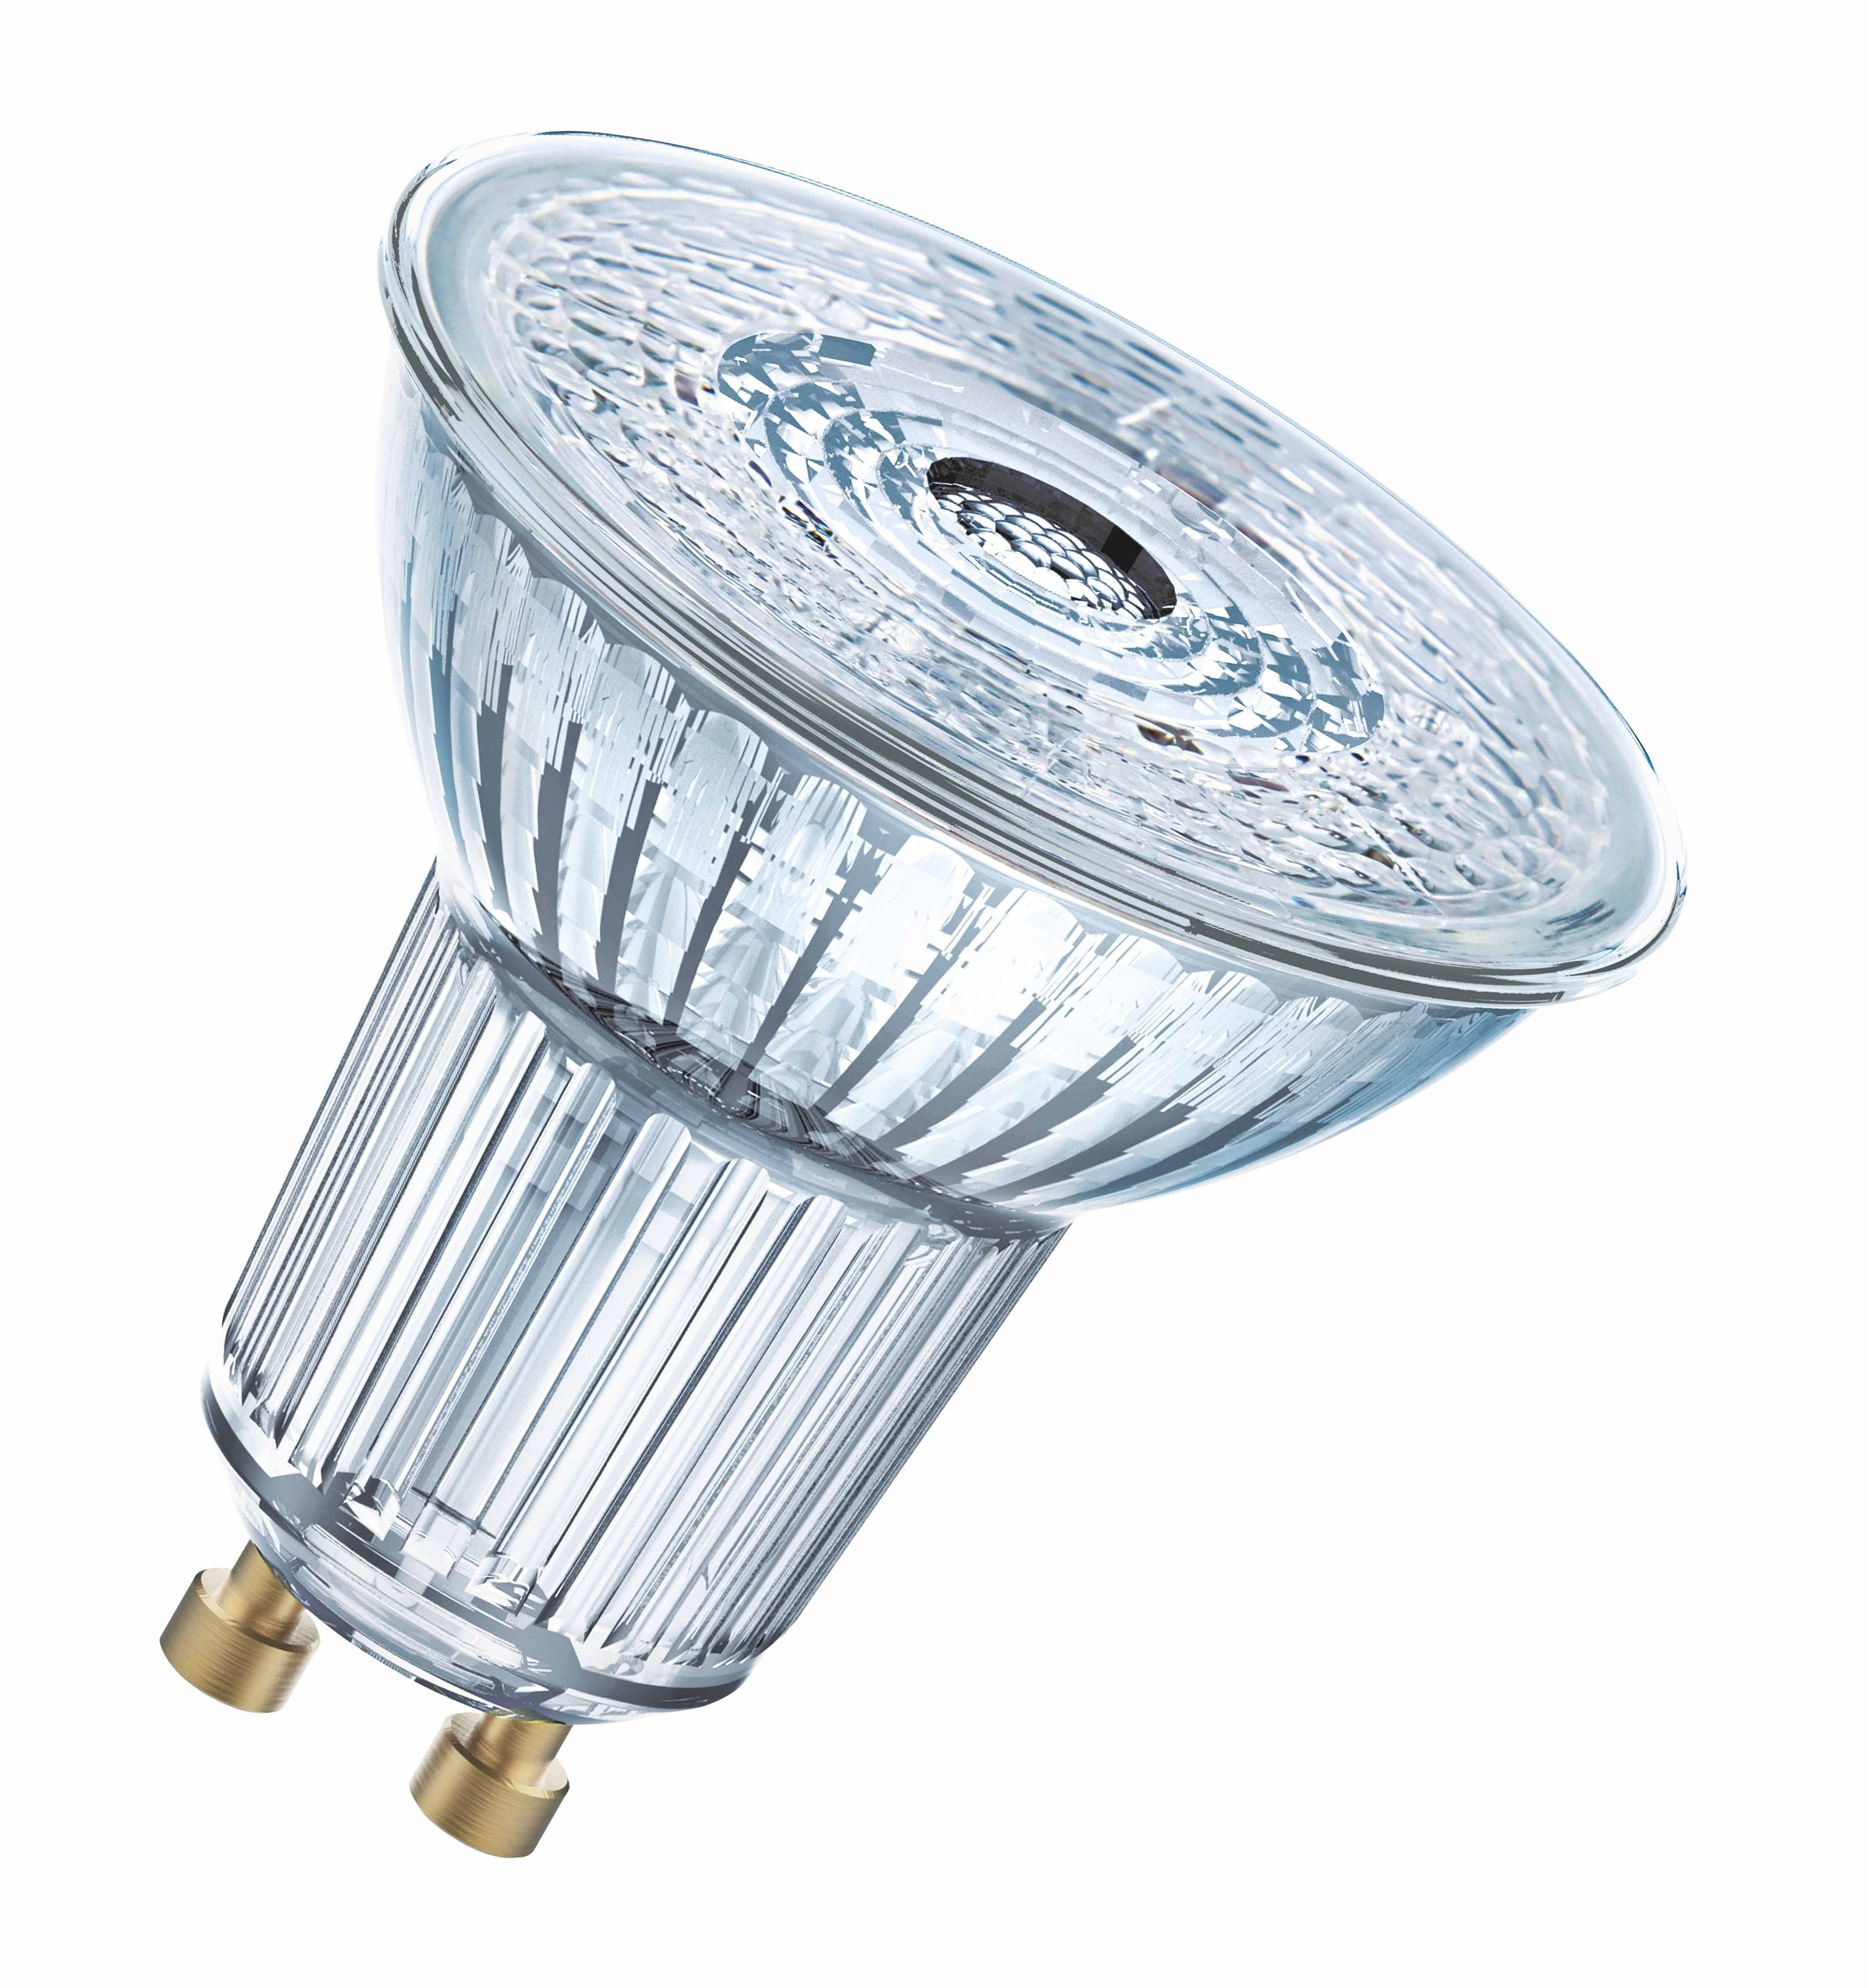 Osram LED SUPERSTAR PAR16 - Dimmbare LED-Lampe, Retrofit-Stecksockel »SST PAR16 7.2W/827 GU10«